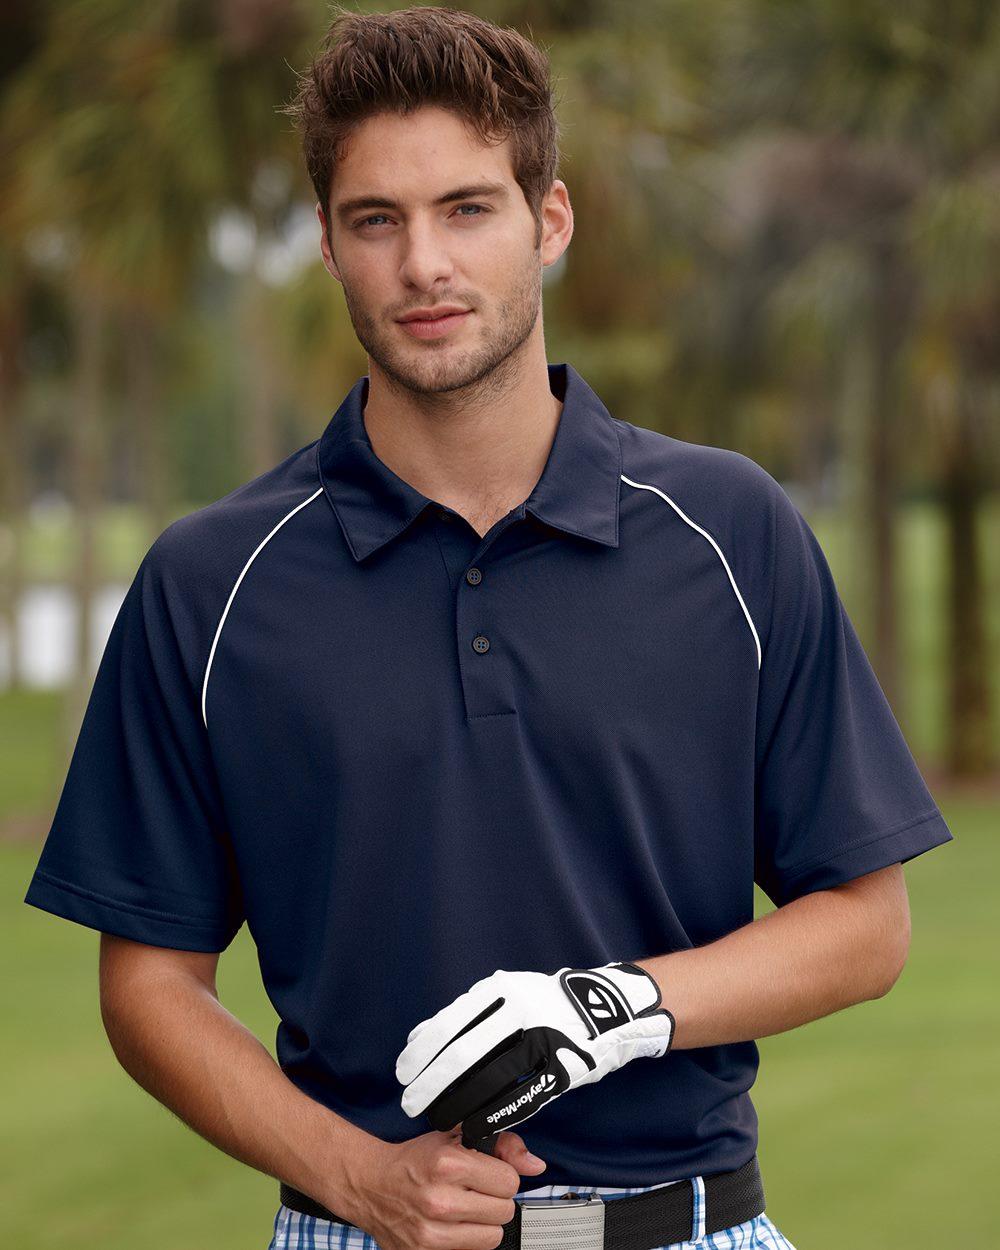 Adidas 阿迪达斯 A82 ClimaLite单珠地(布) PoloT恤